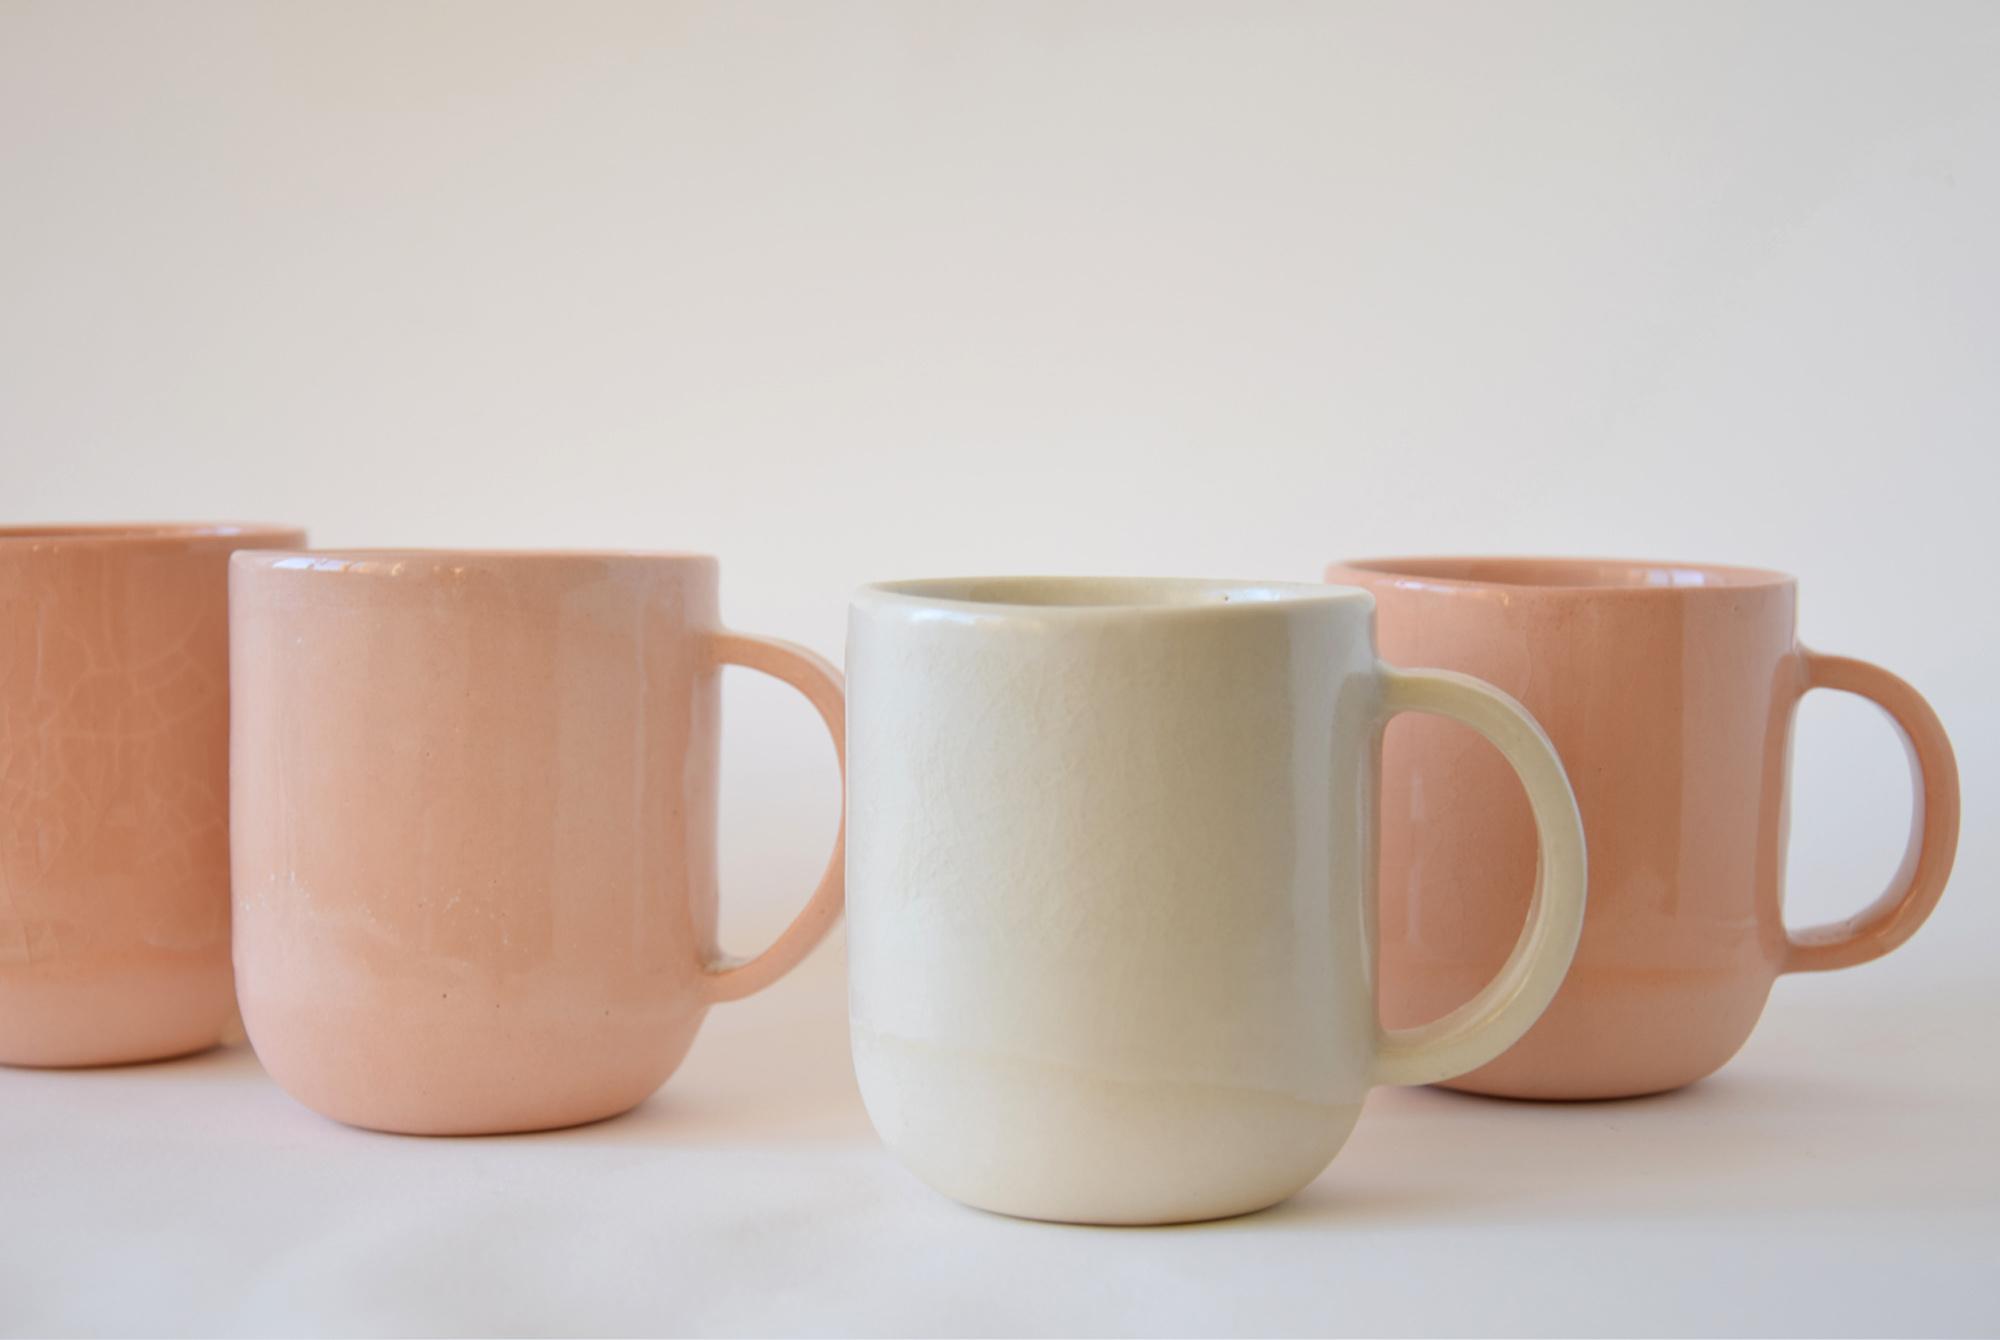 colourcups-rosecollection-studiokryszewski.jpg